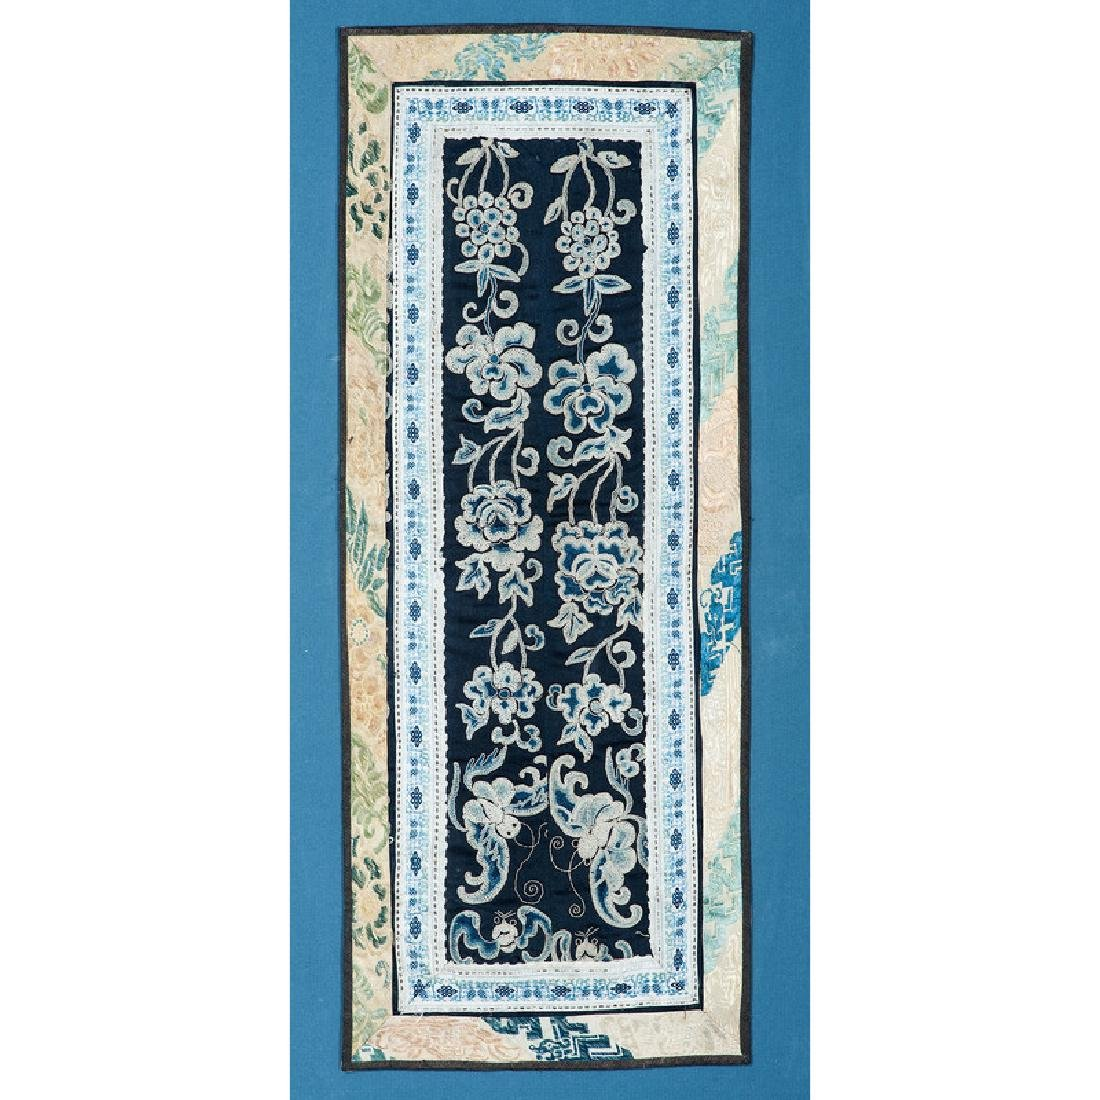 Silk Embroidered Robe Cuff